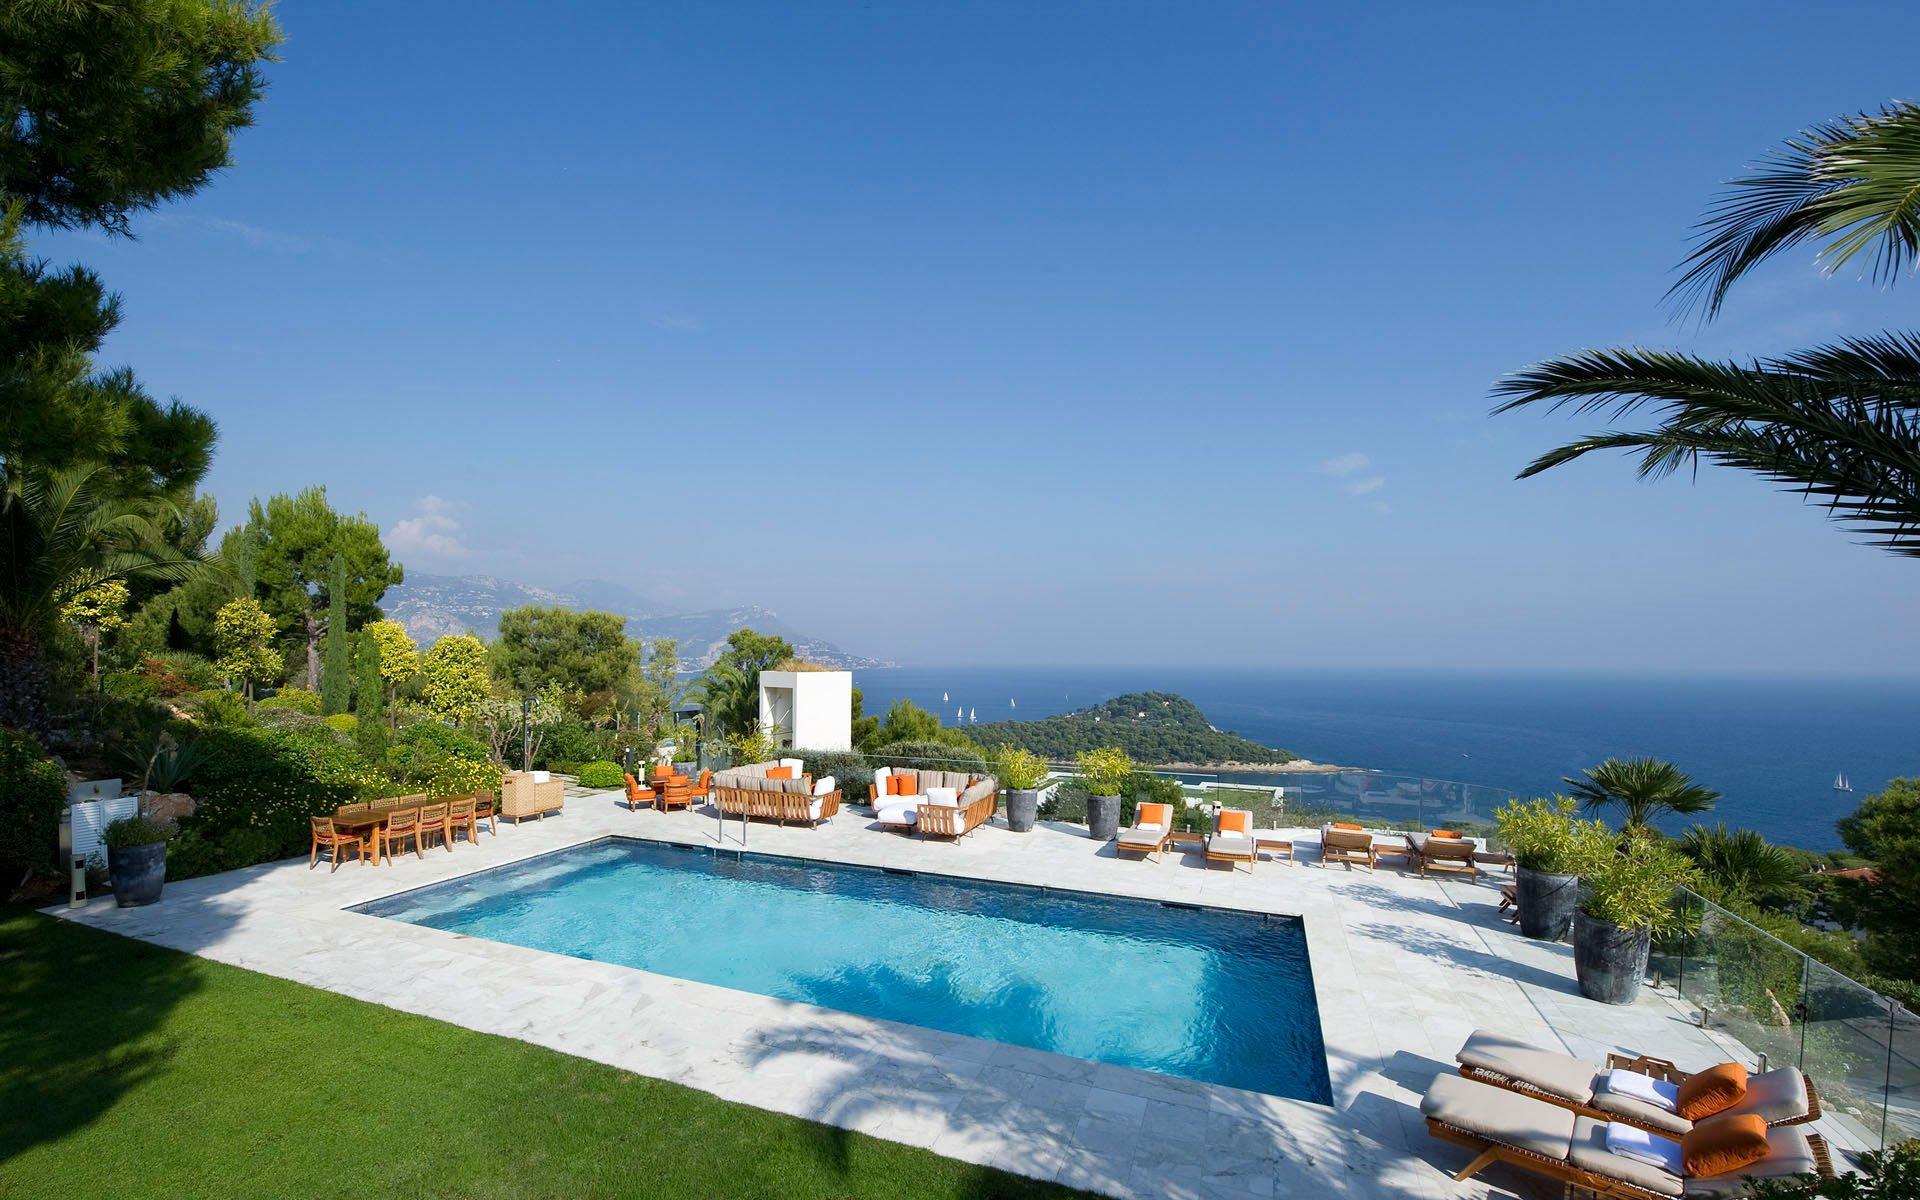 luxury mediteranean cview villa in st jean cap ferrat caandesign architecture and home. Black Bedroom Furniture Sets. Home Design Ideas